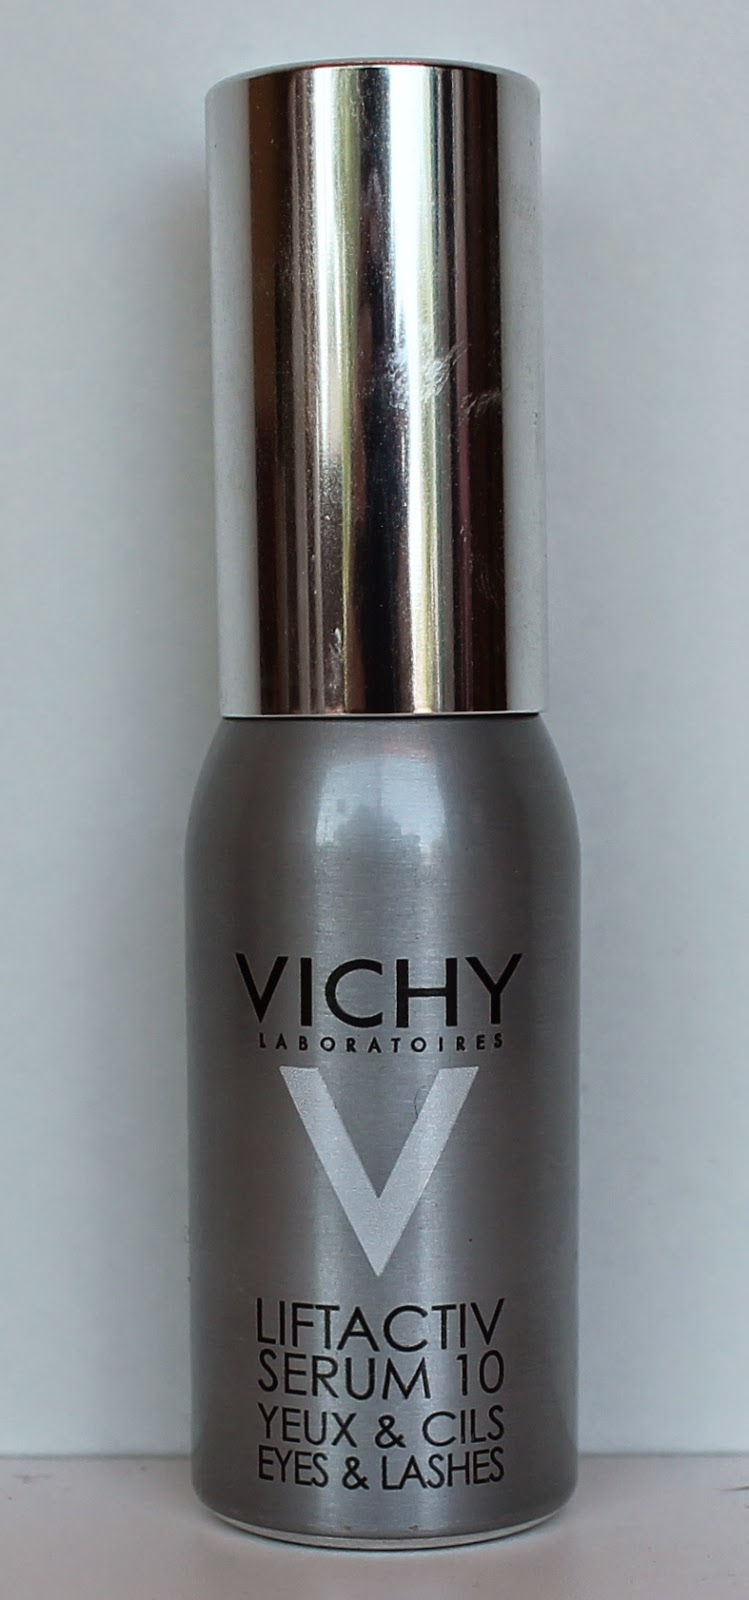 Serum 10 yeux & cils Liftactiv Vichy